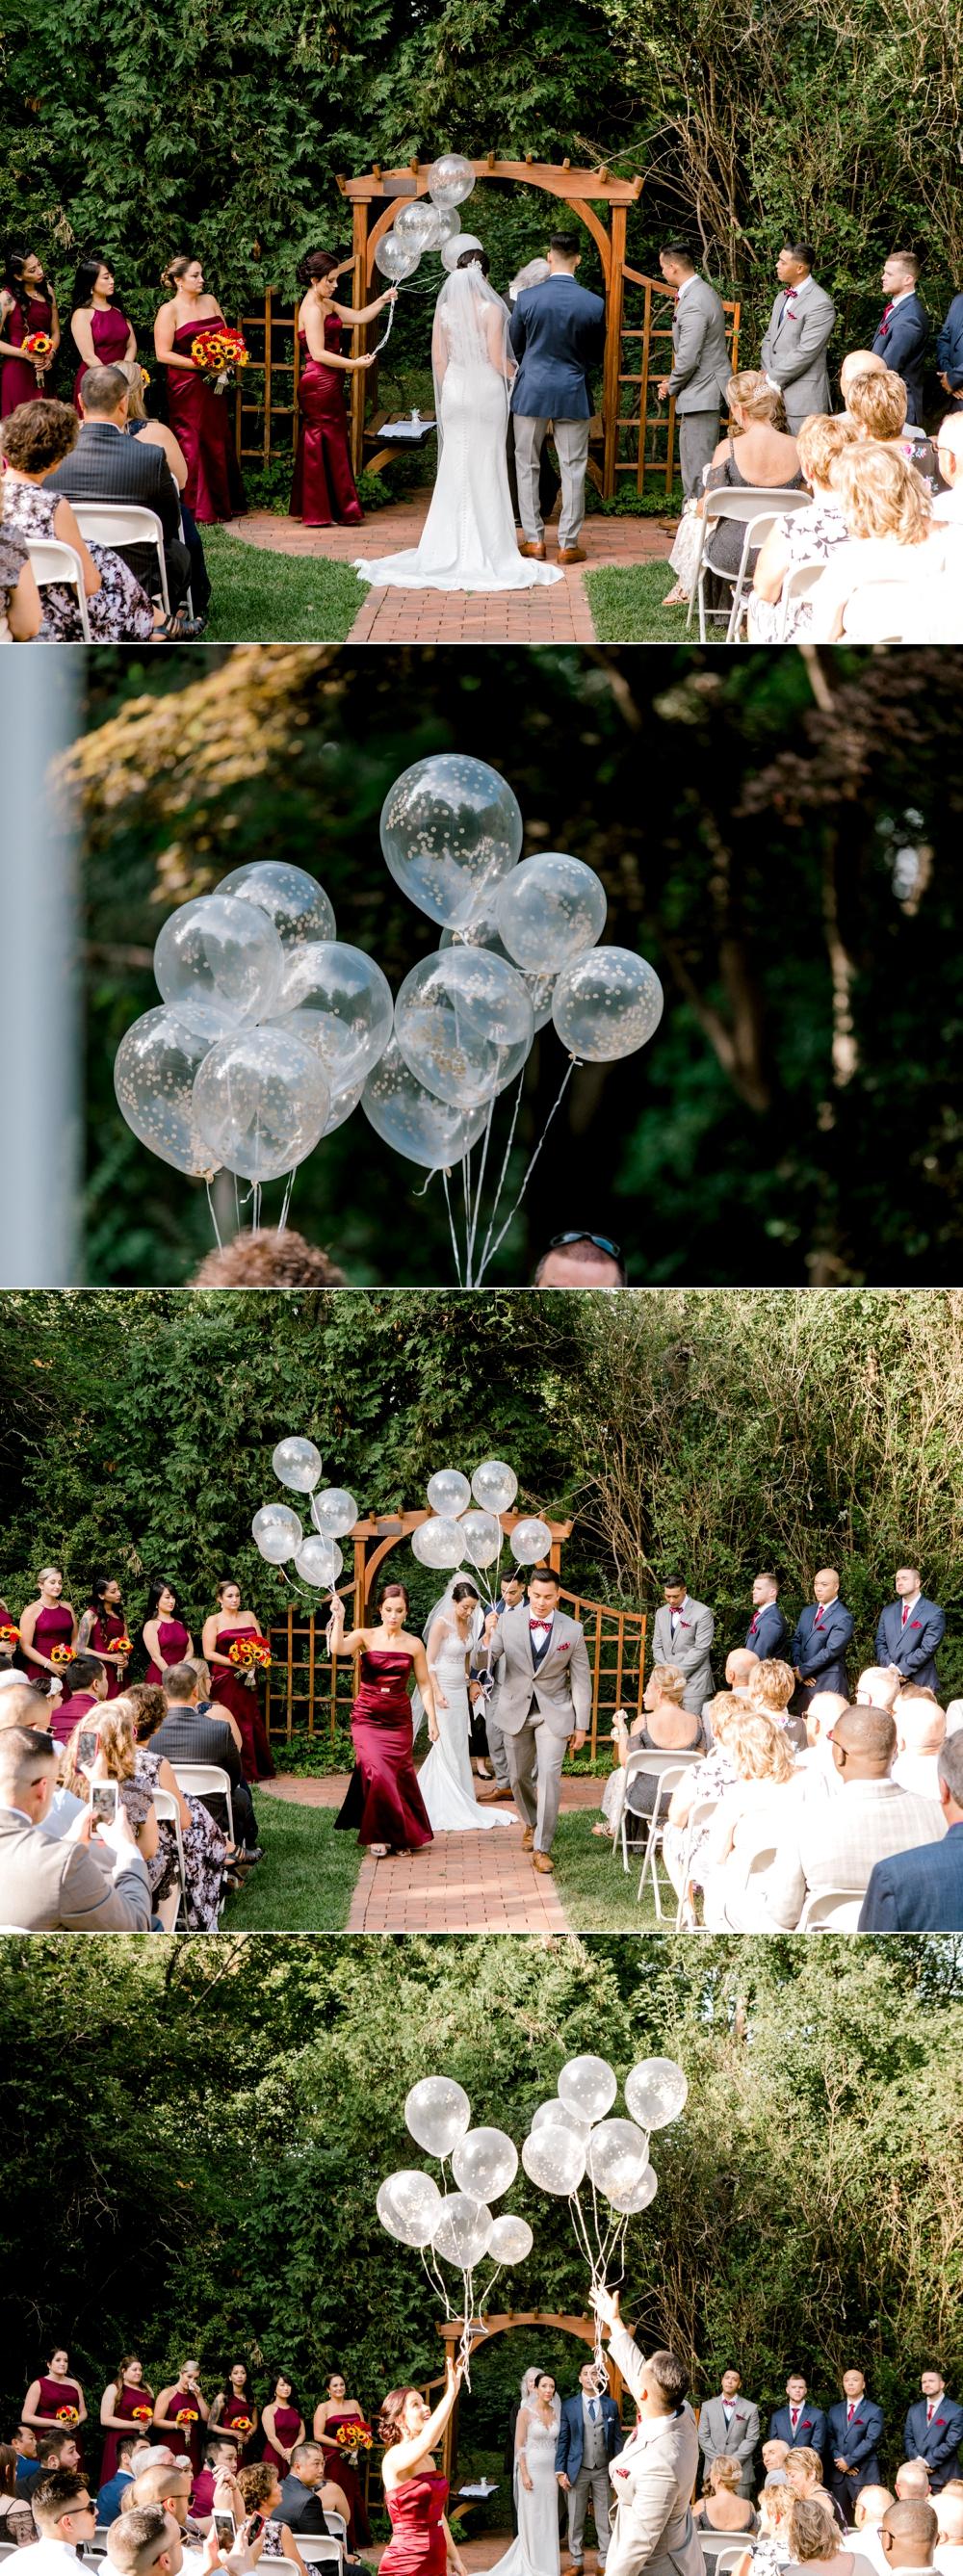 SomerbyJonesPhotography__SmithBarnWedding_SmithBarn_WeddingatSmithBarn_0025.jpg